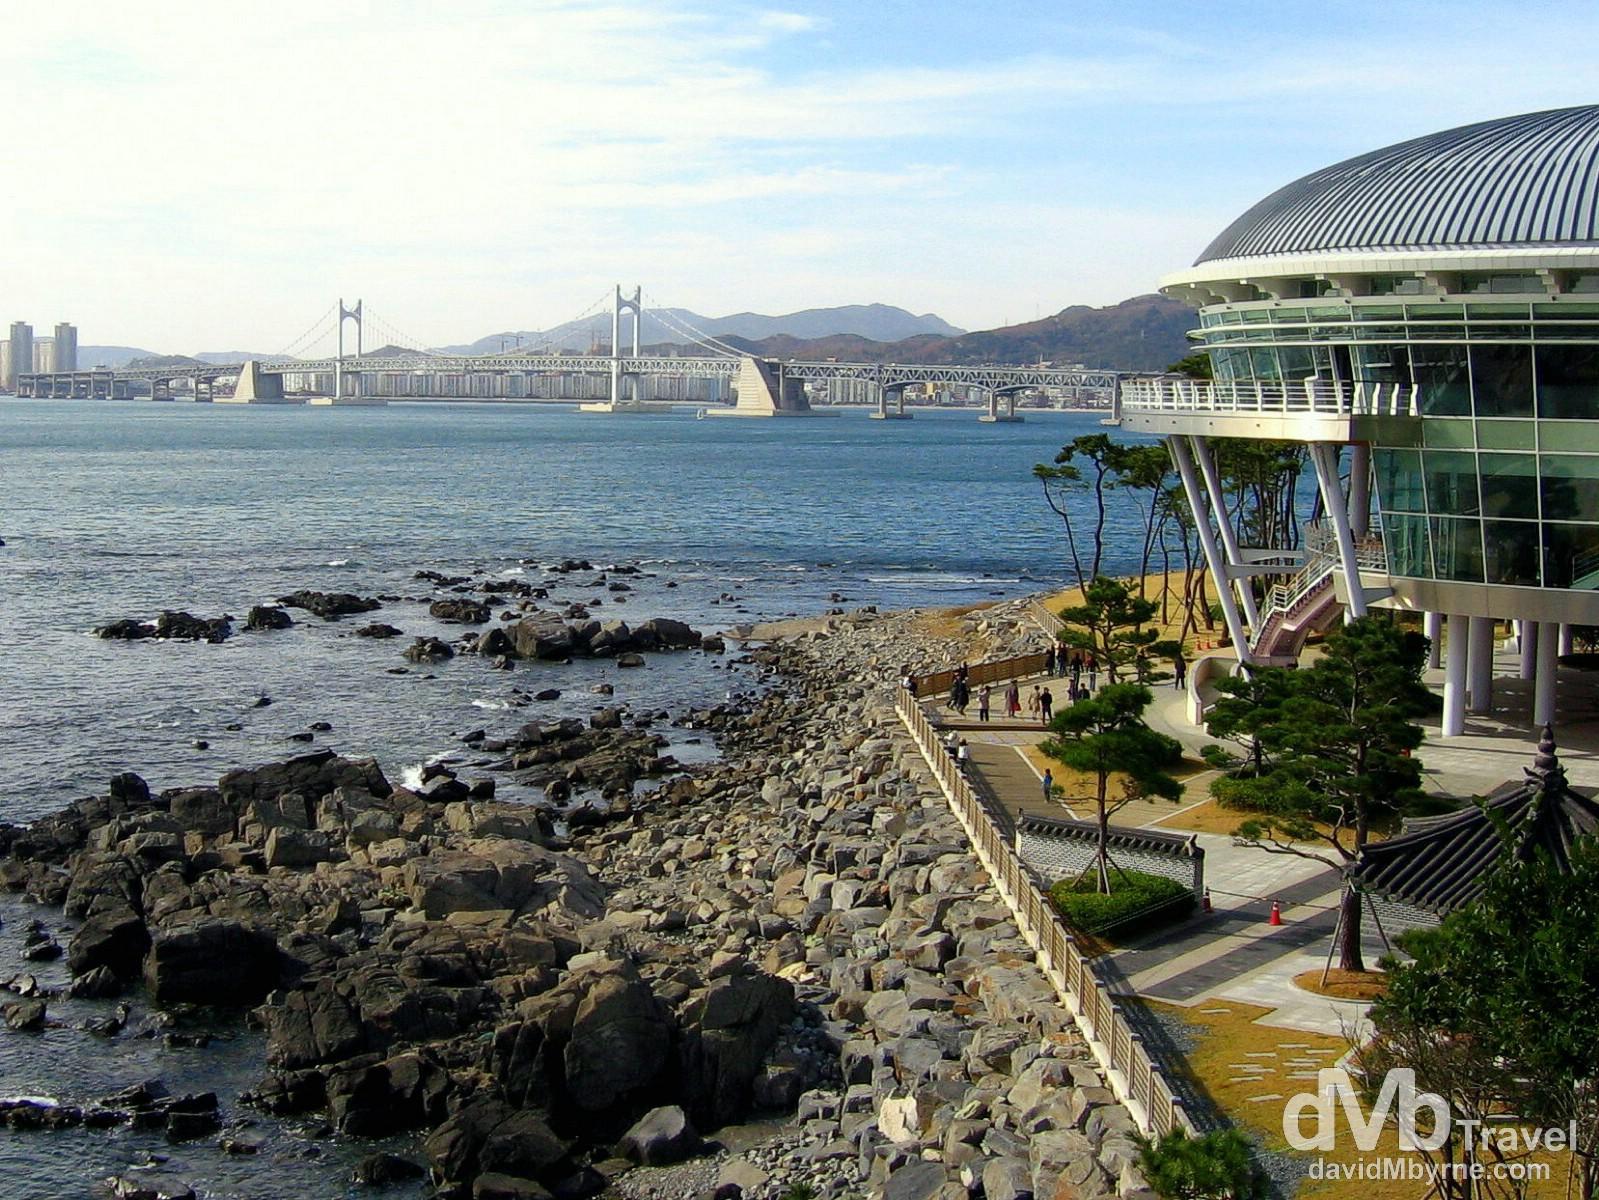 Nurimaru, Dongbaek Island, Busan, South Korea. November 18th, 2007.